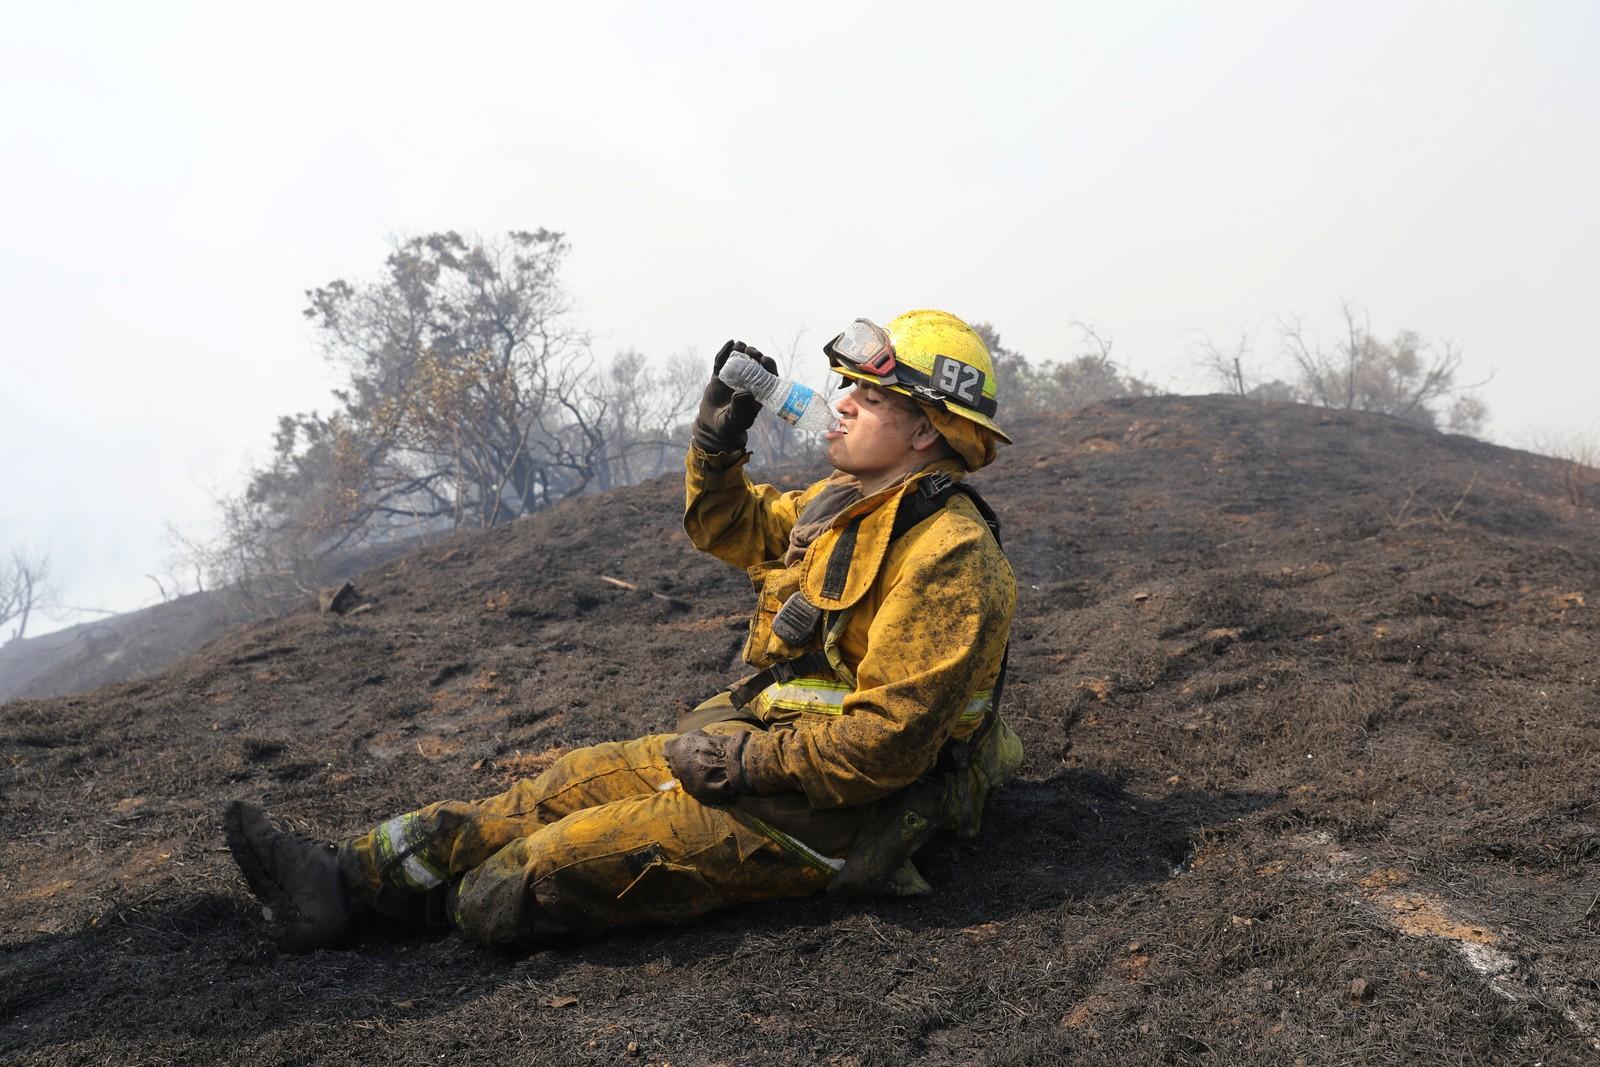 En brannmann tar seg en vannslurk og en pust i bakken under slokkearbeid i Mandeville Canyon i Los Angeles.